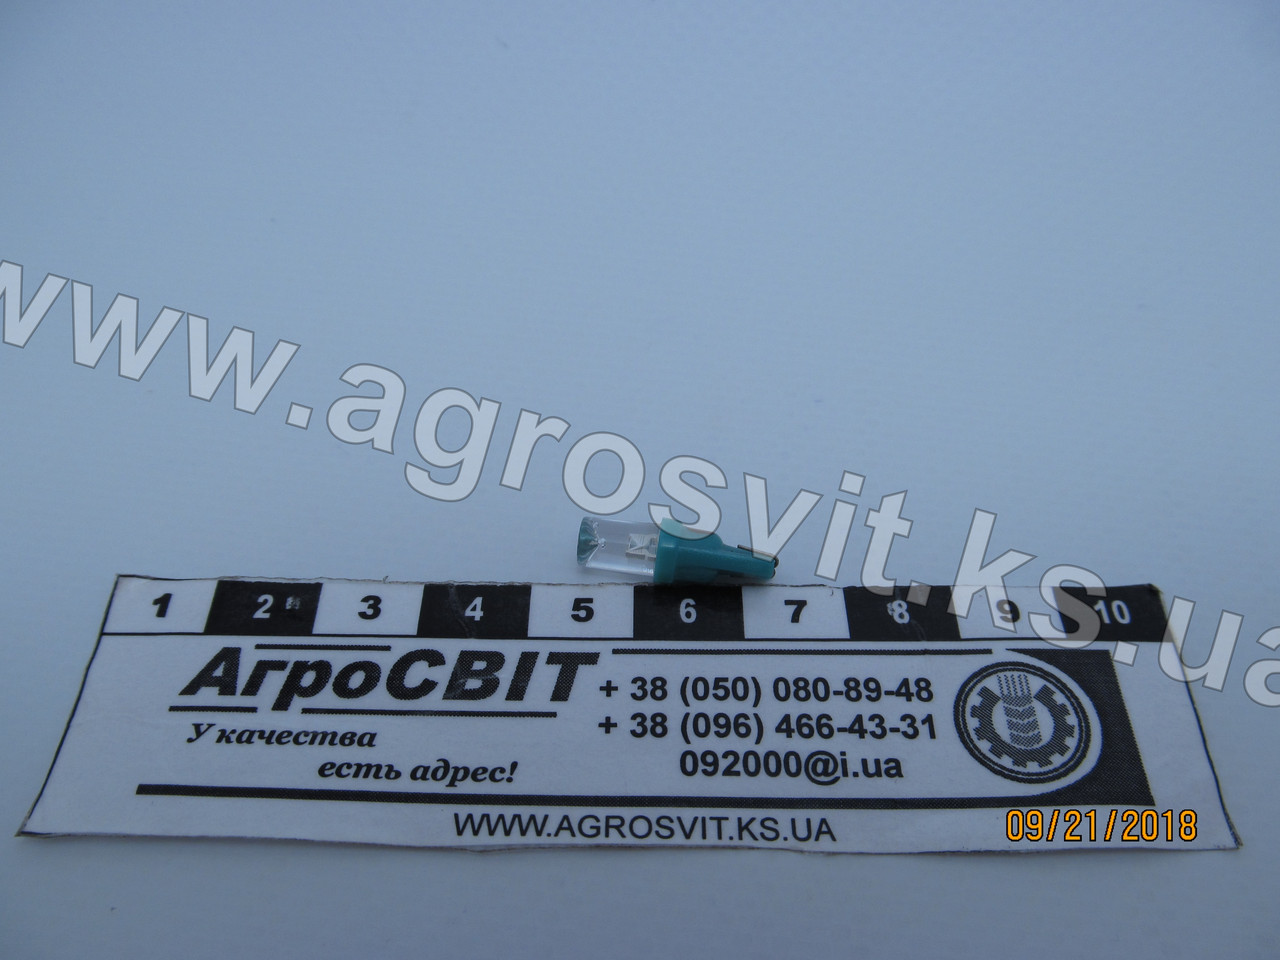 Лампа 12 V приборная (пластиковый цоколь) зеленая, каталожный № 2600003